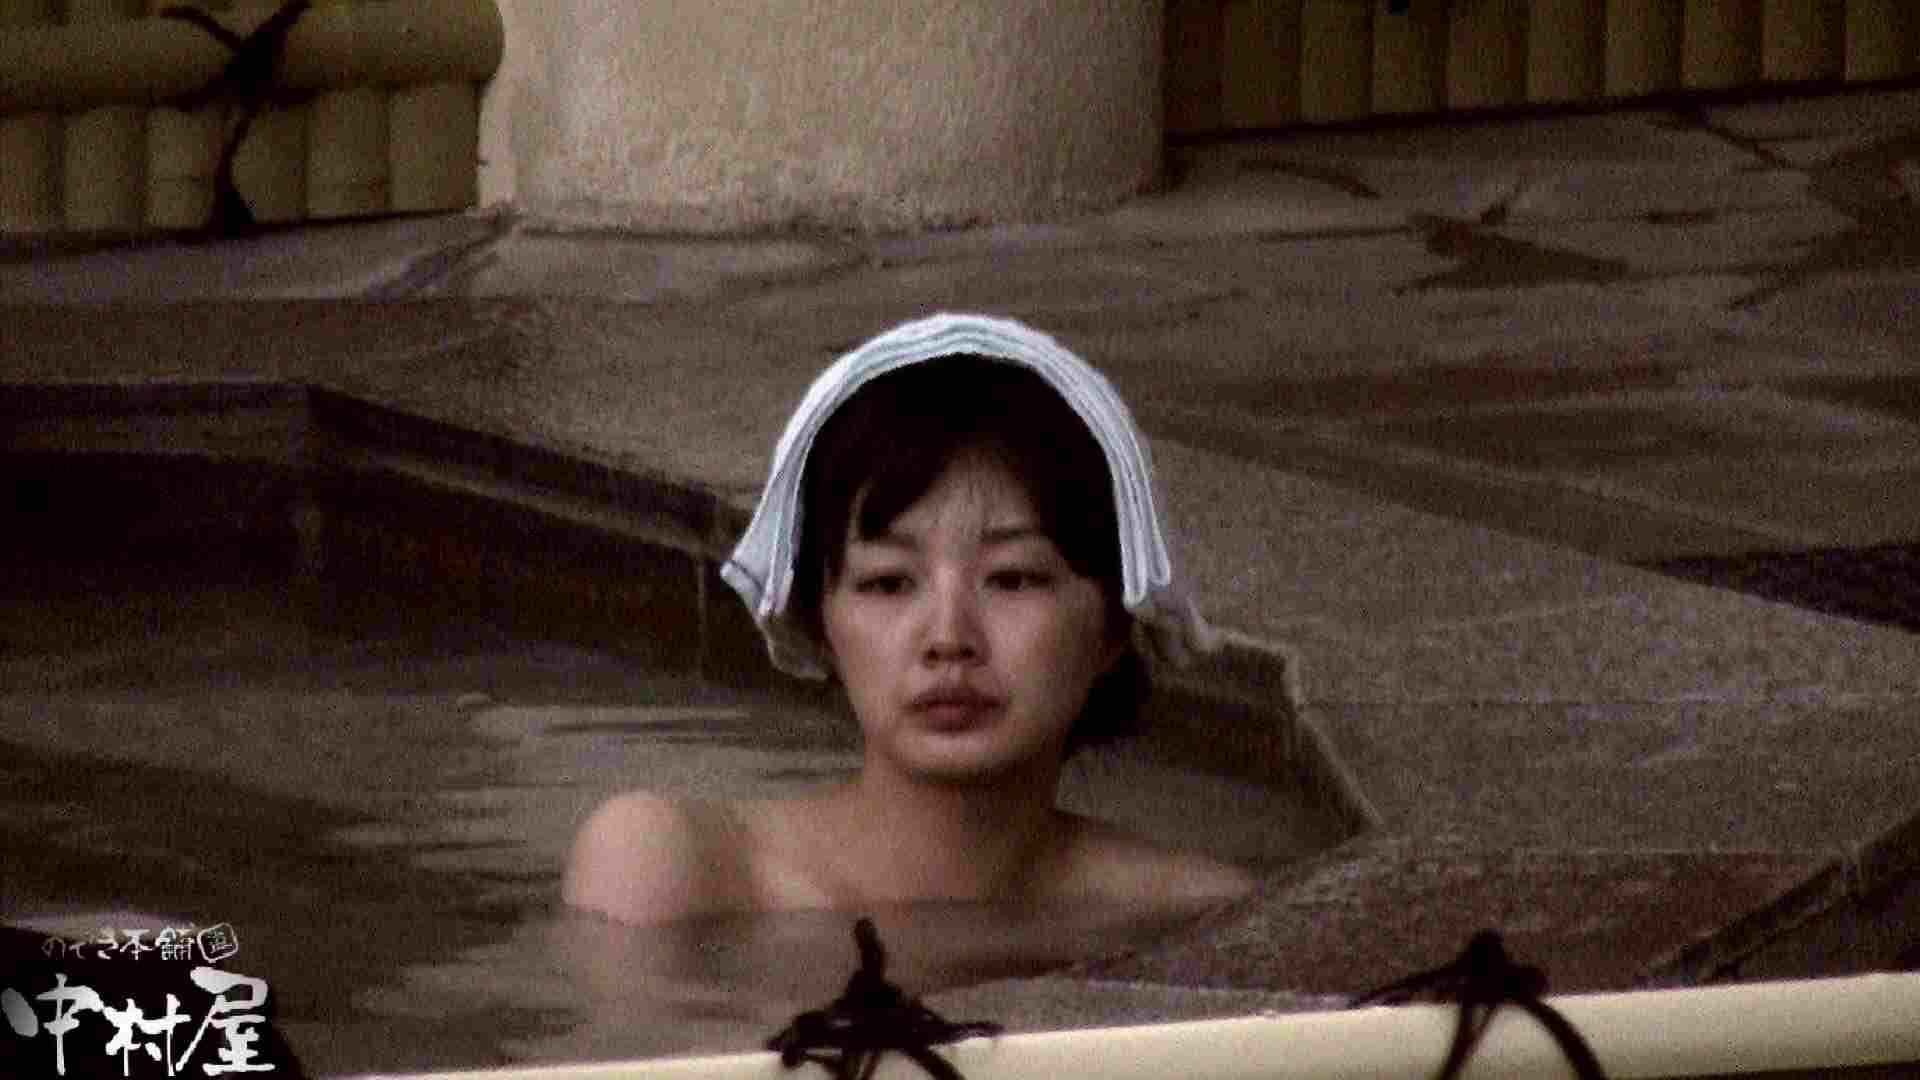 Aquaな露天風呂Vol.916 盗撮大放出 盗み撮り動画 75連発 34